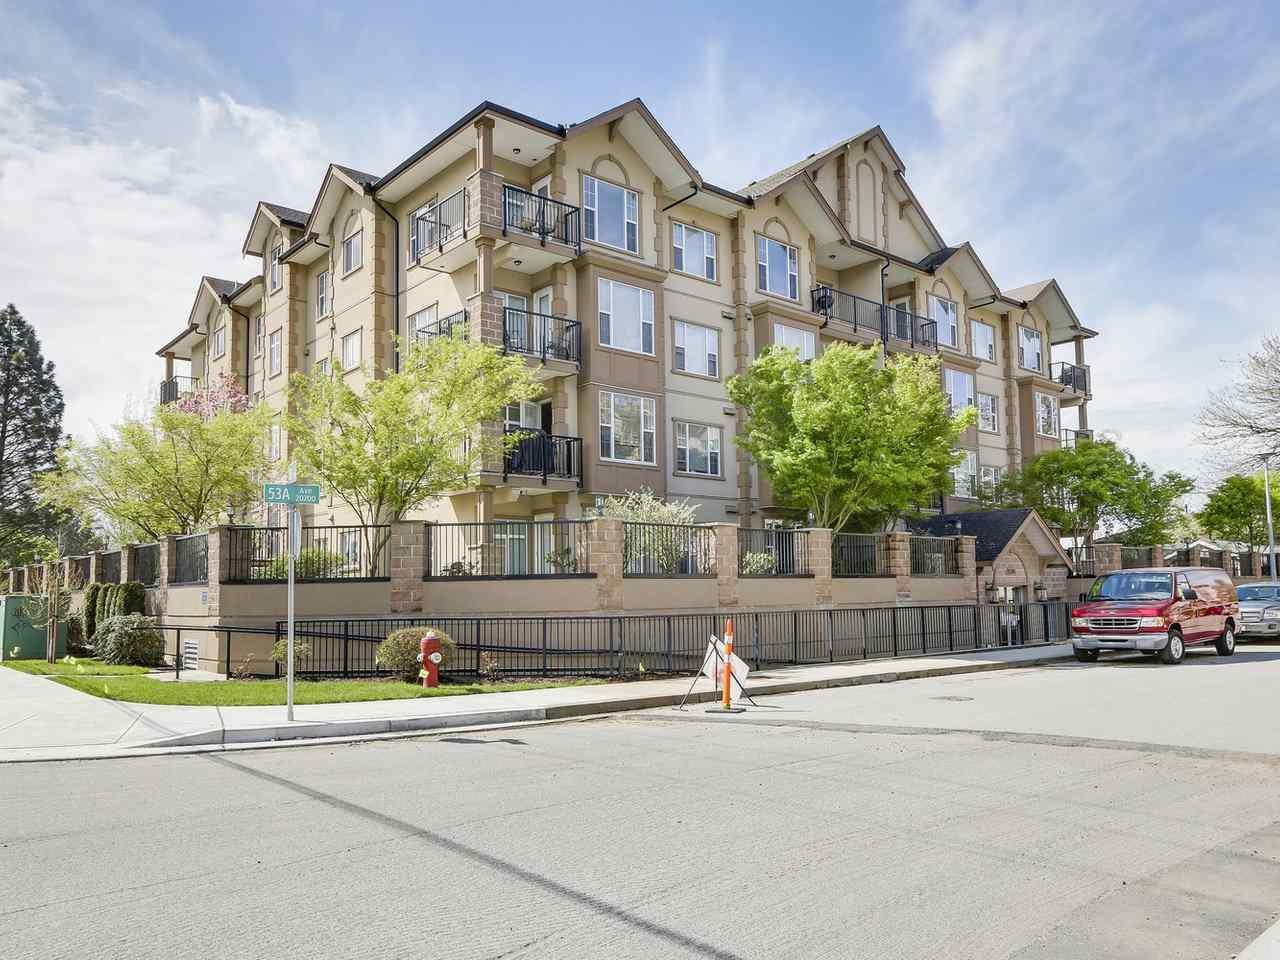 R2158193 - 306 20286 53A AVENUE, Langley City, Langley, BC - Apartment Unit